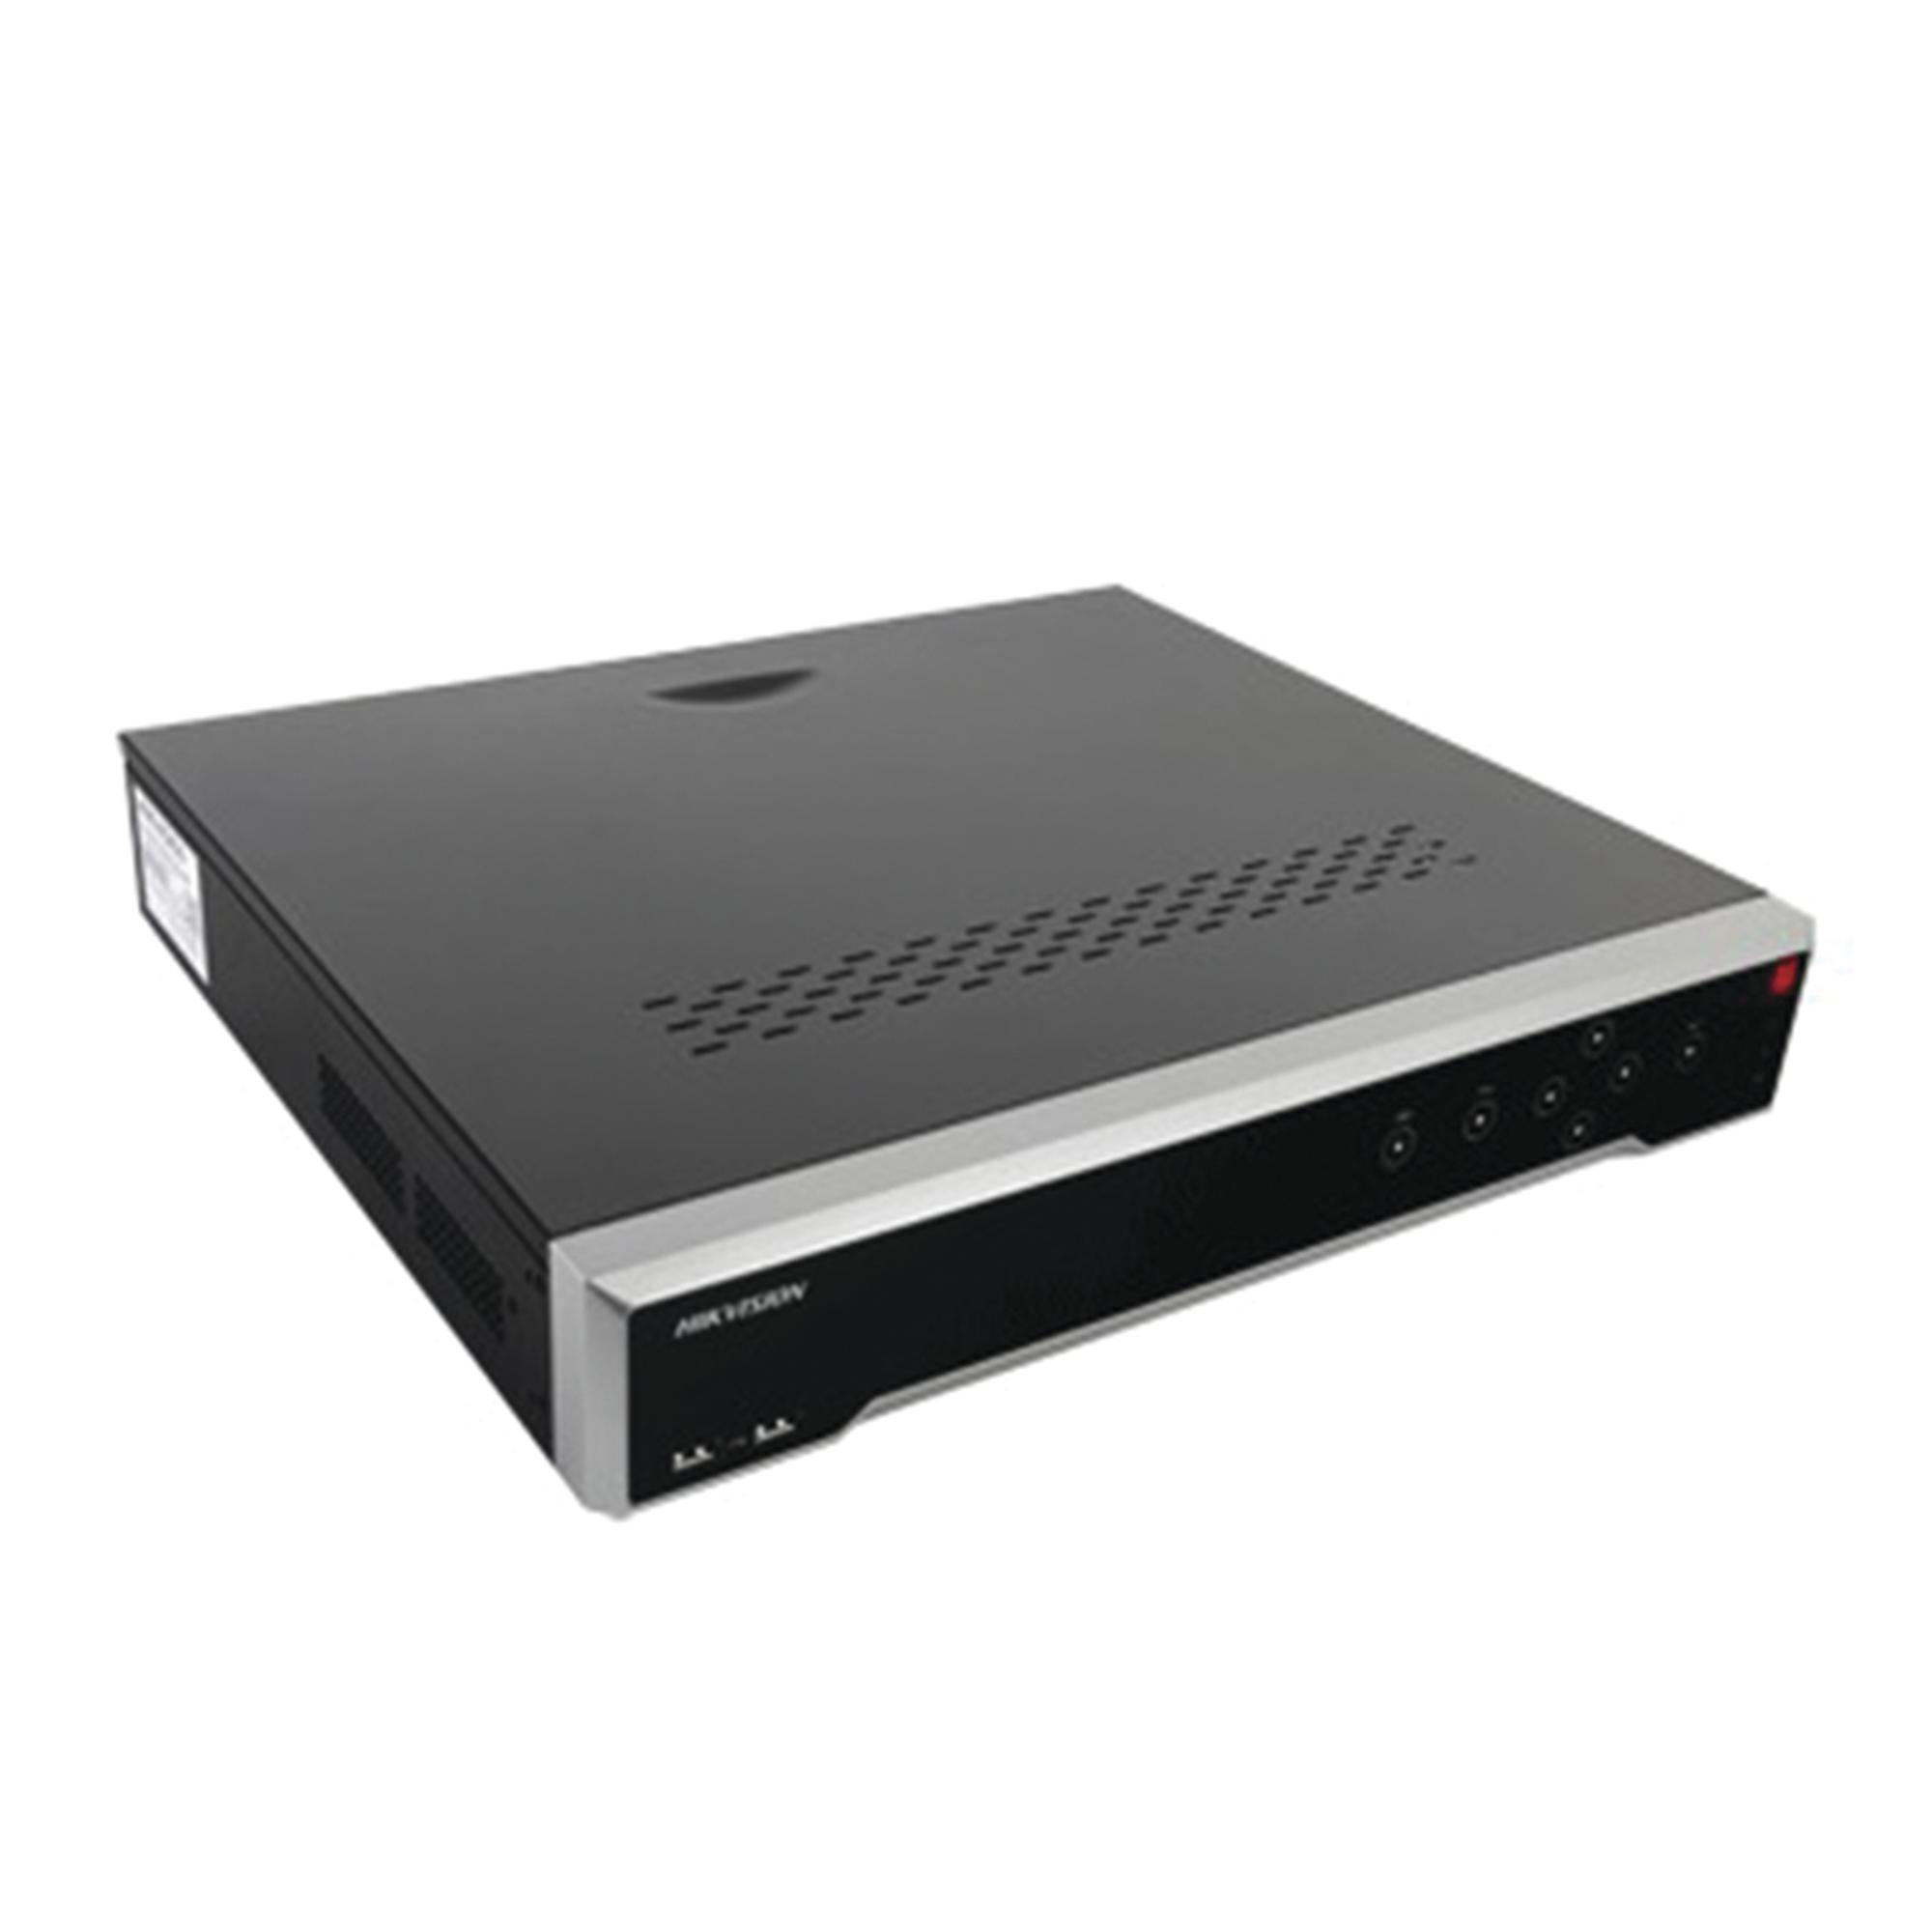 NVR 8 Megapixel (4K) / 32 canales IP / 16 Puertos PoE+ / 4 Bahías de Disco Duro / Switch PoE 300 mts / HDMI en 4K